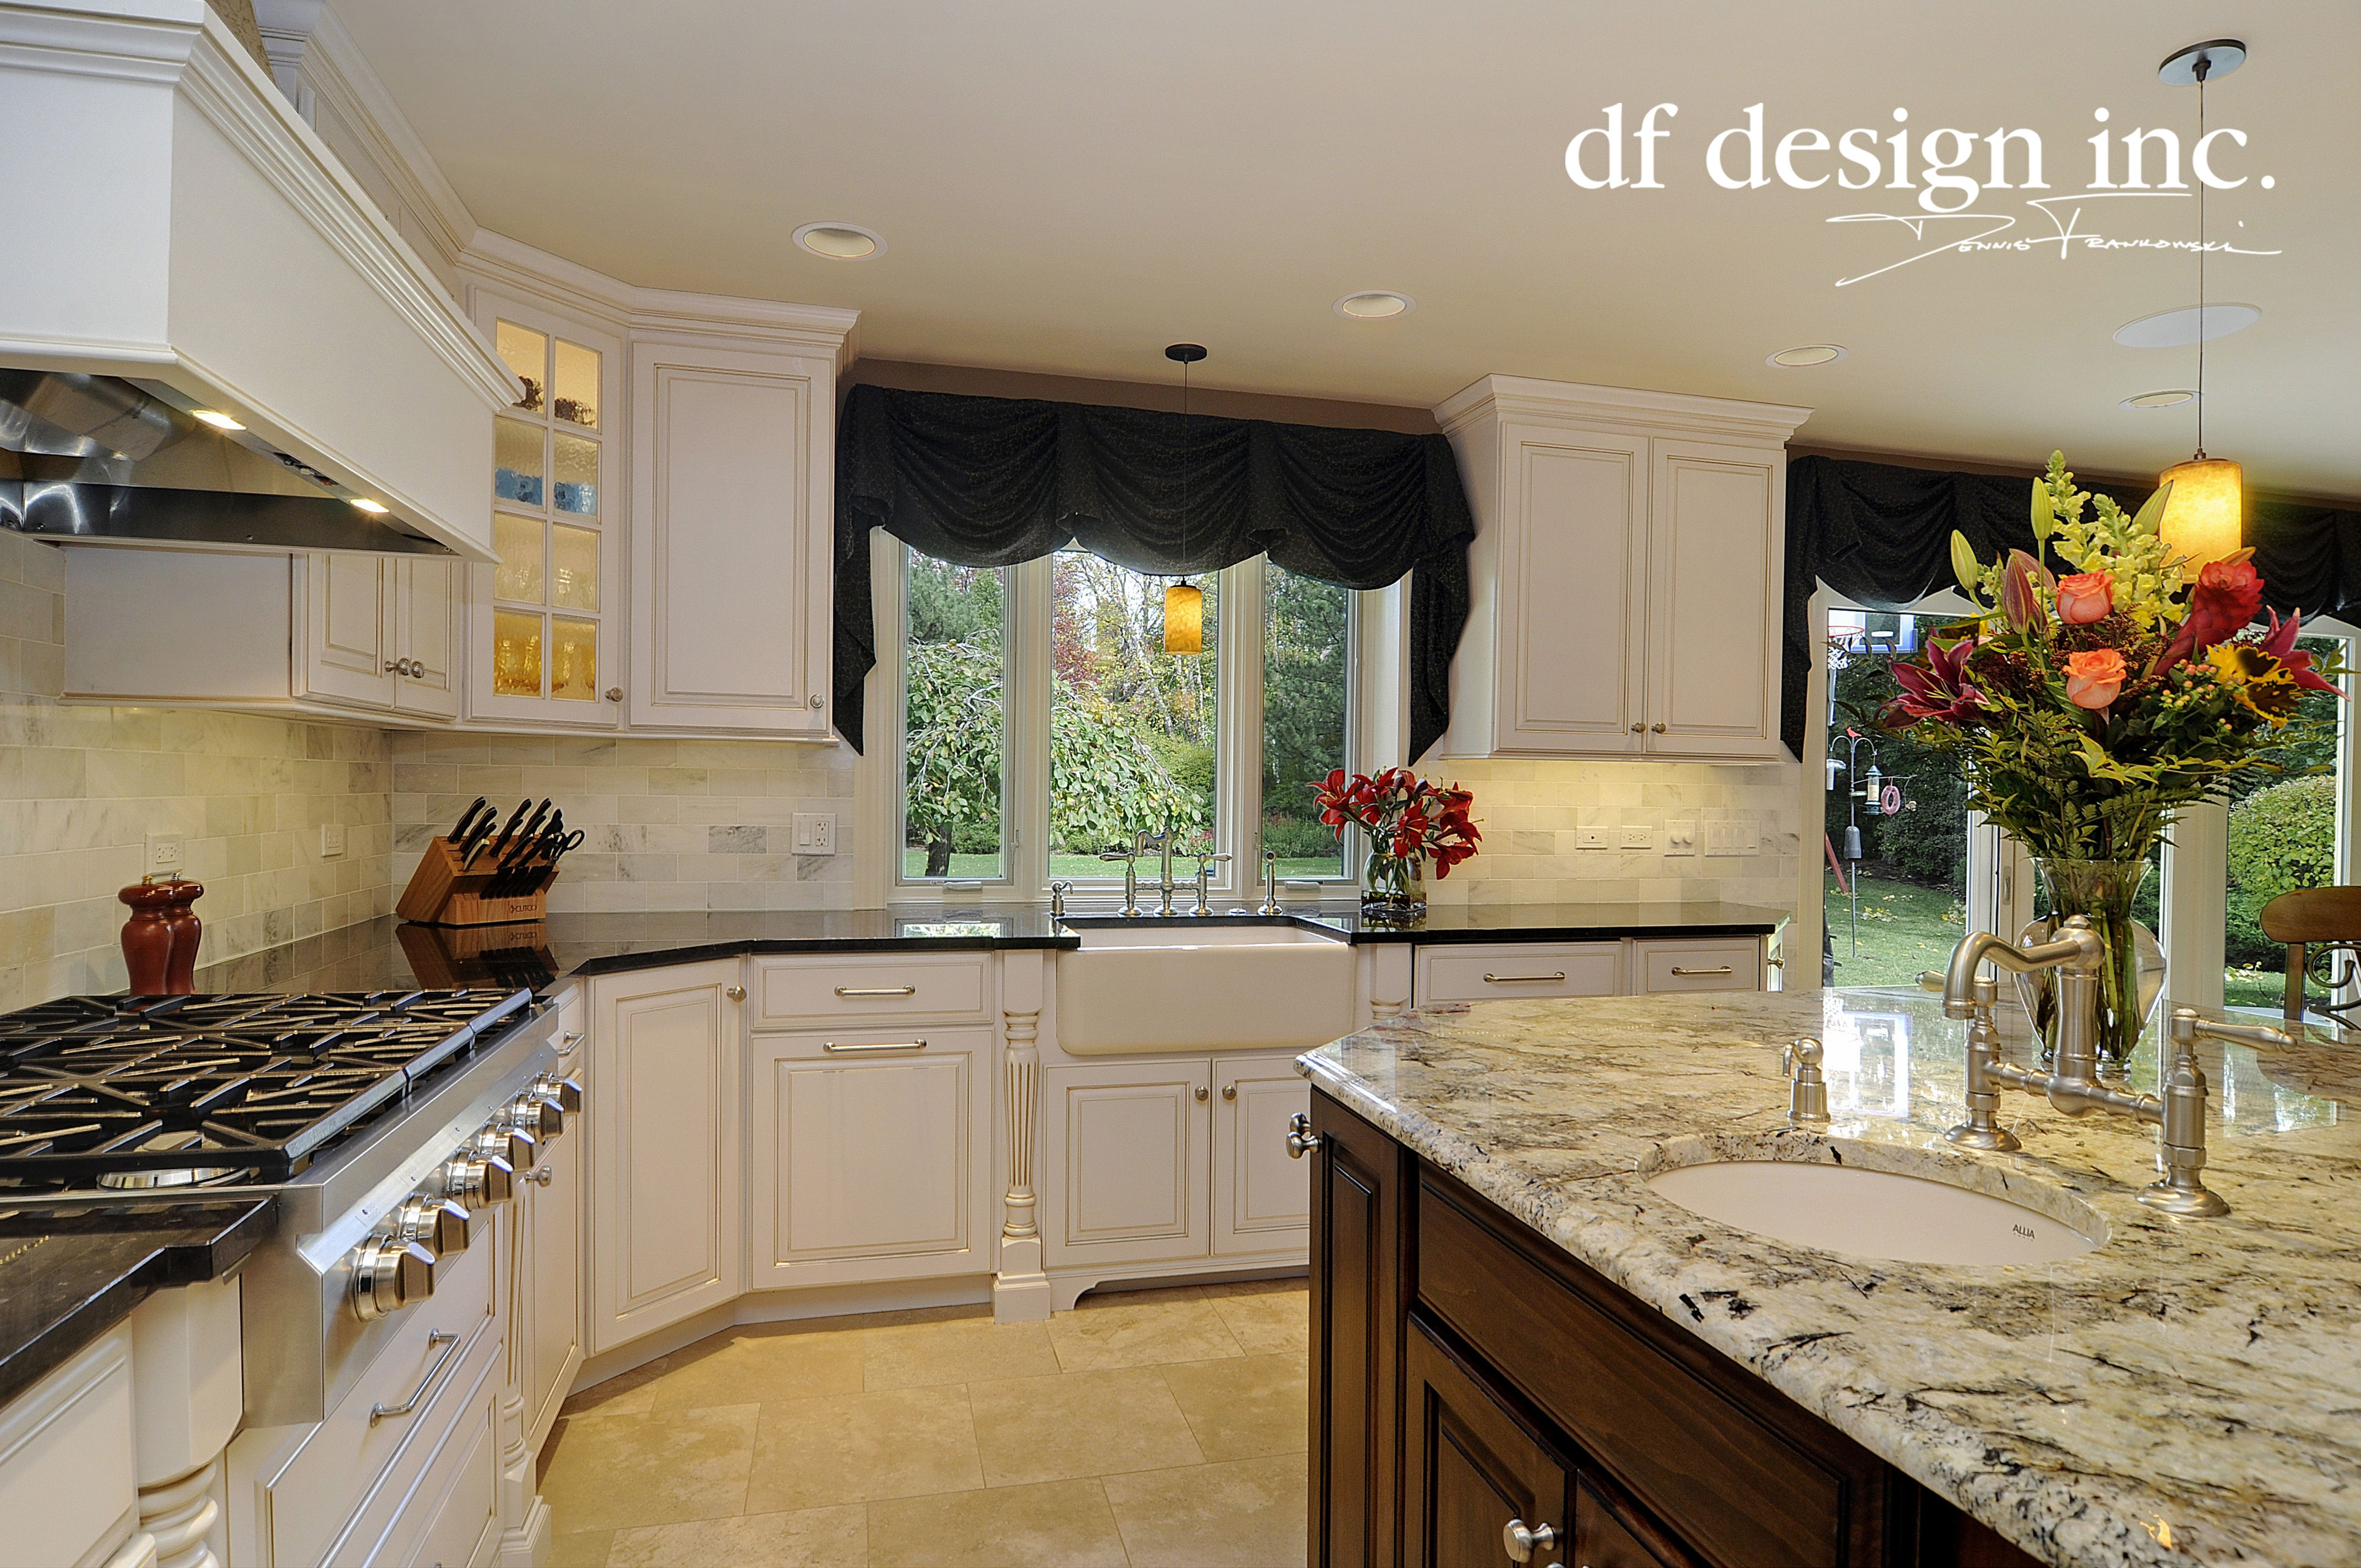 Kitchen design portfolio kitchen design and design portfolios